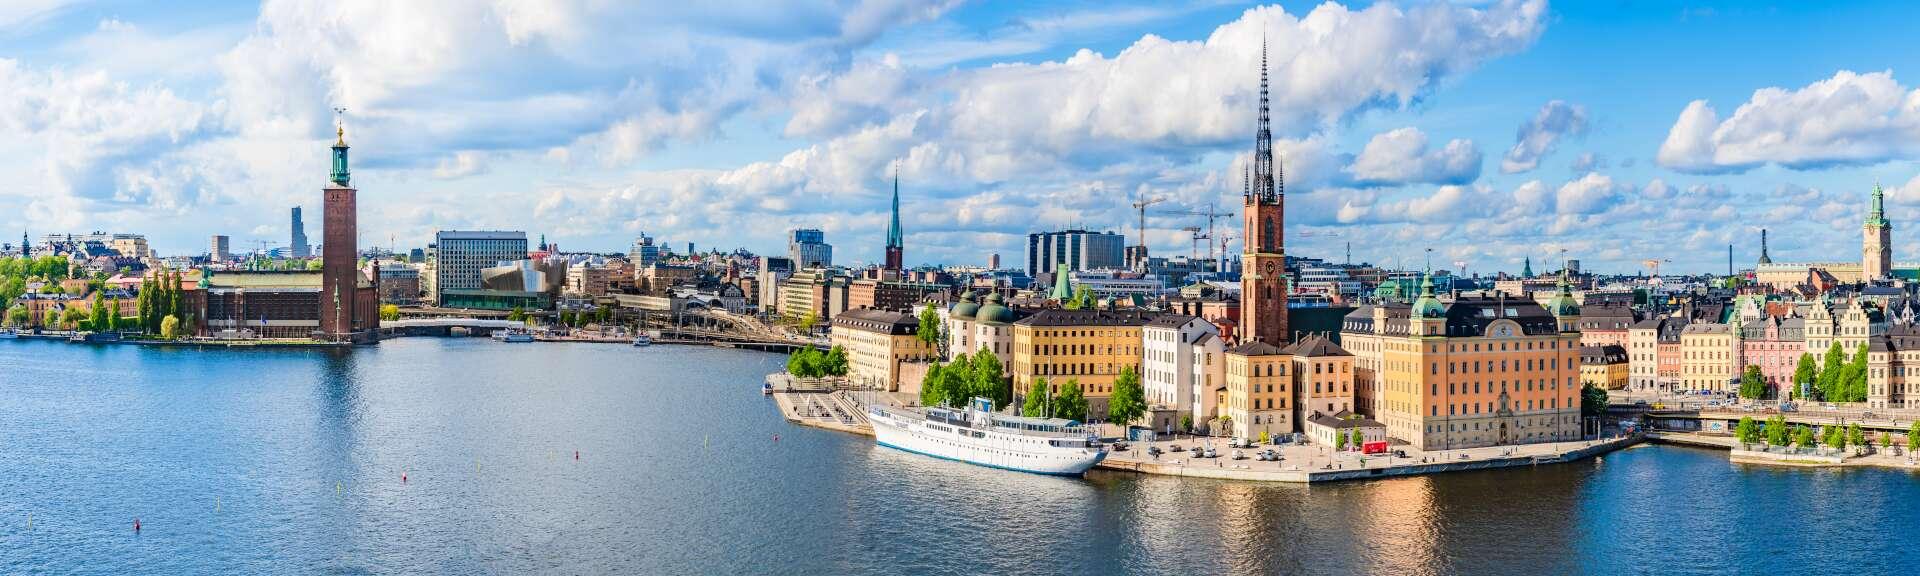 Klassenfahrt Stockholm Stadtansicht